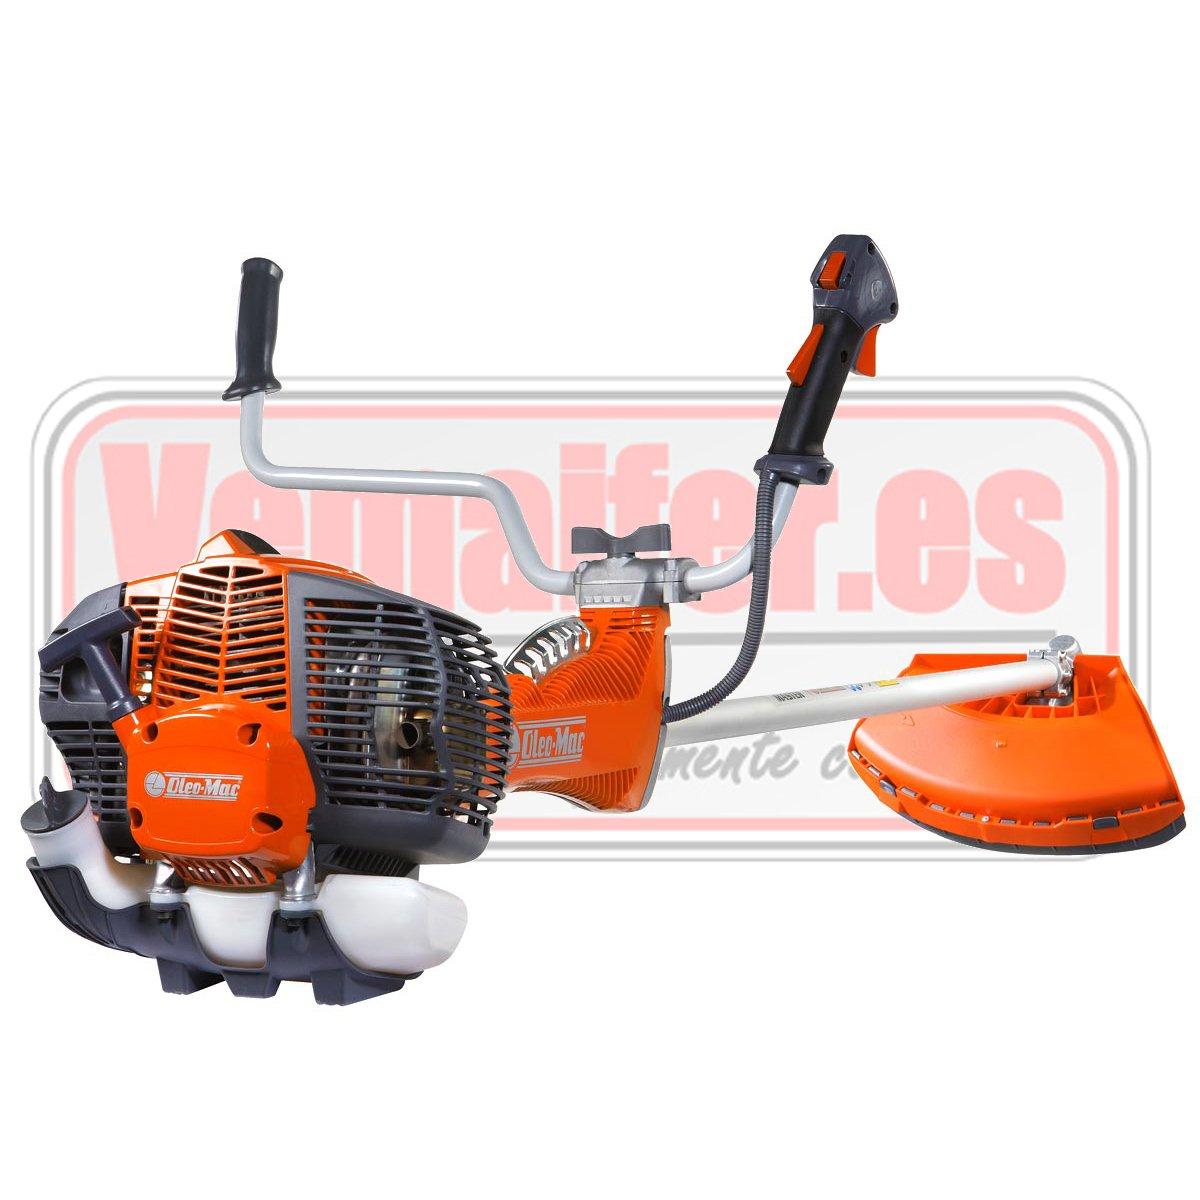 Desbrozadora Oleo Mac BC 550 MASTER precio oferta